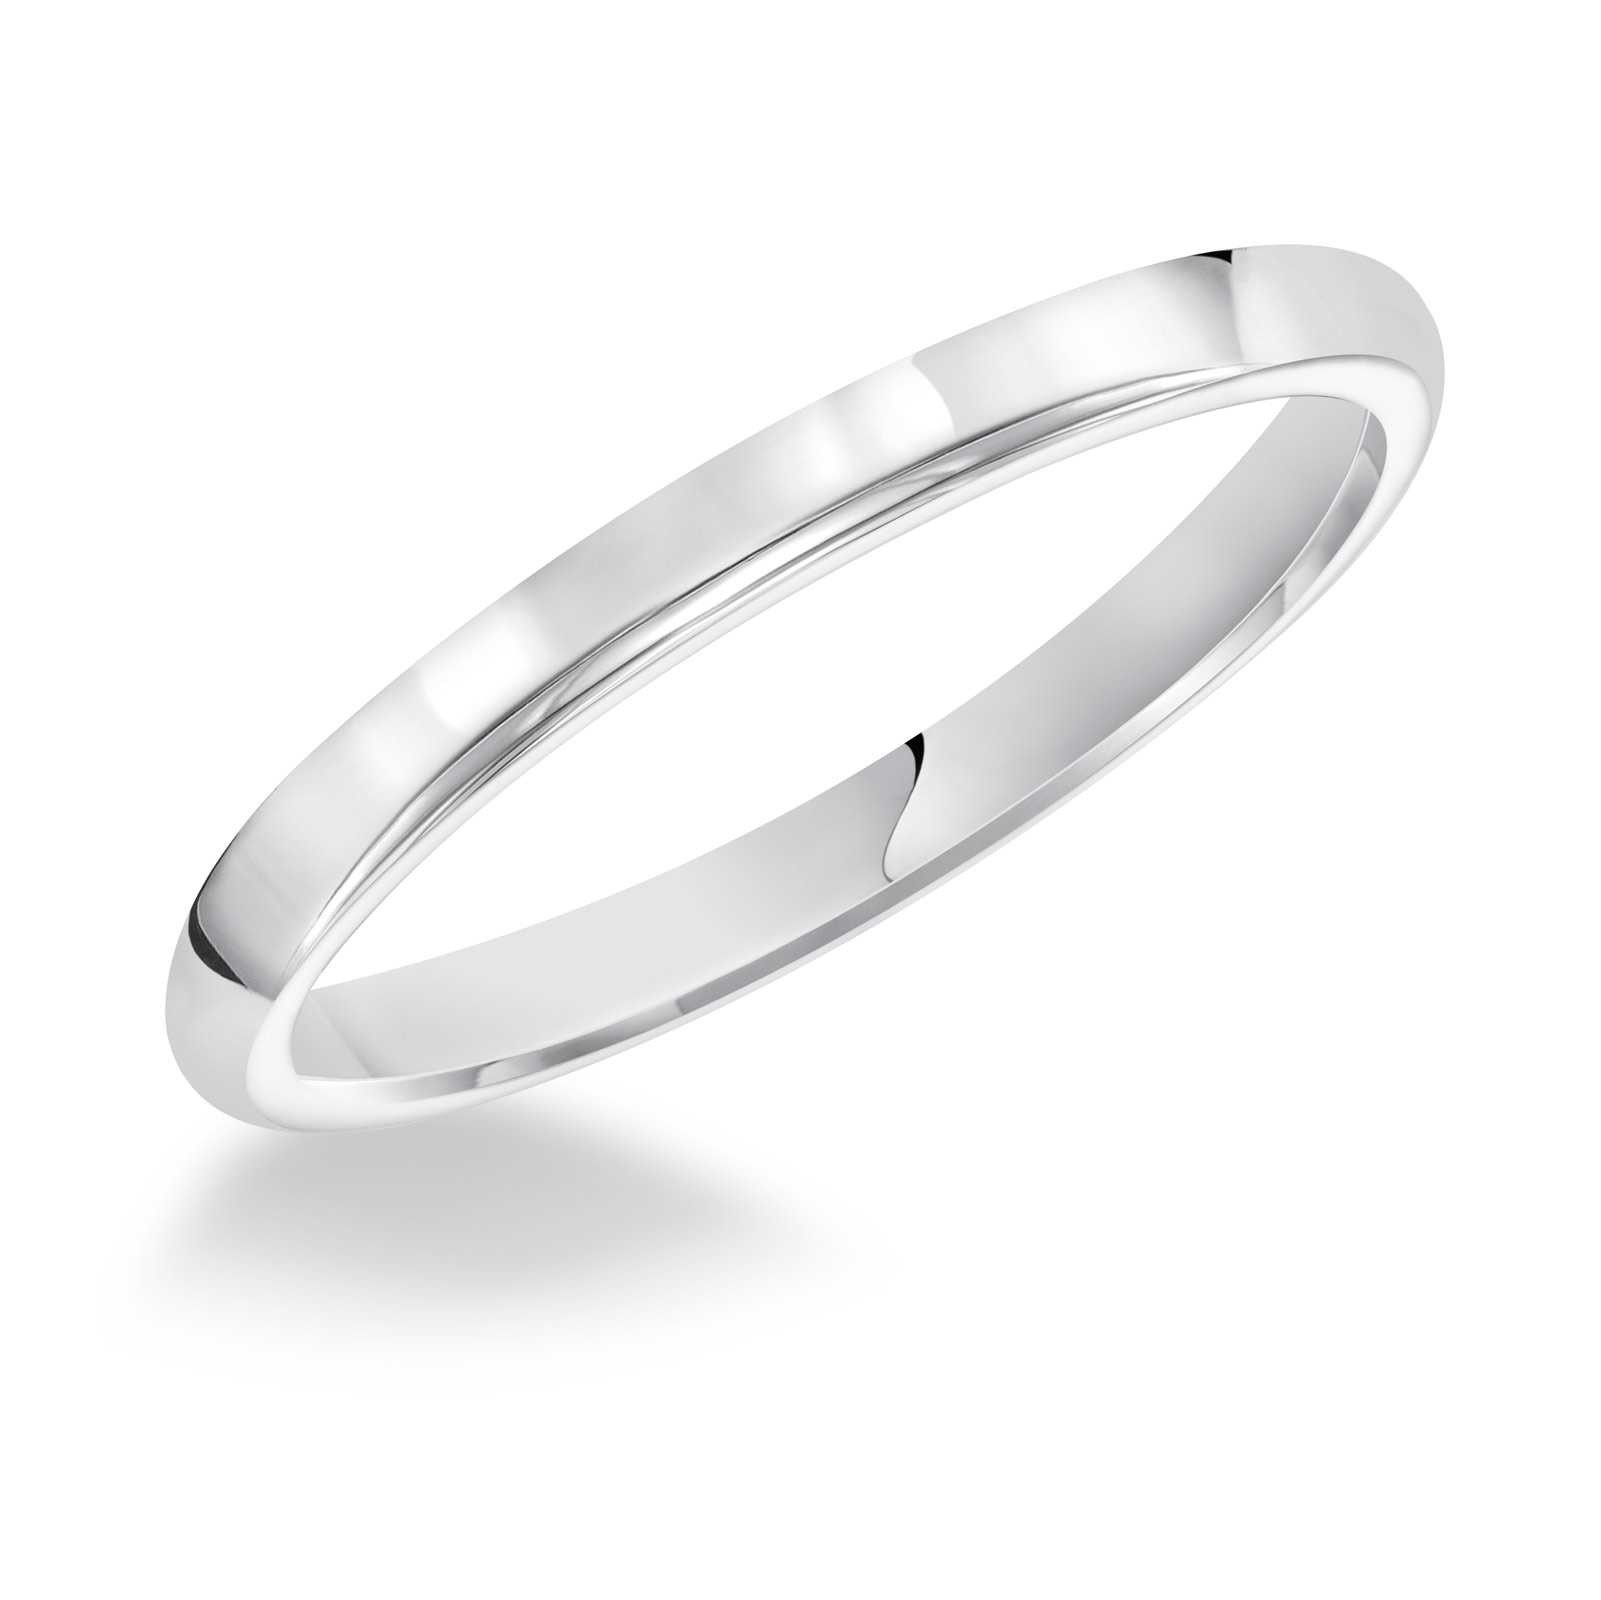 Goldman ring 01 pir025 g01 long island ny mens wedding for Long island wedding bands